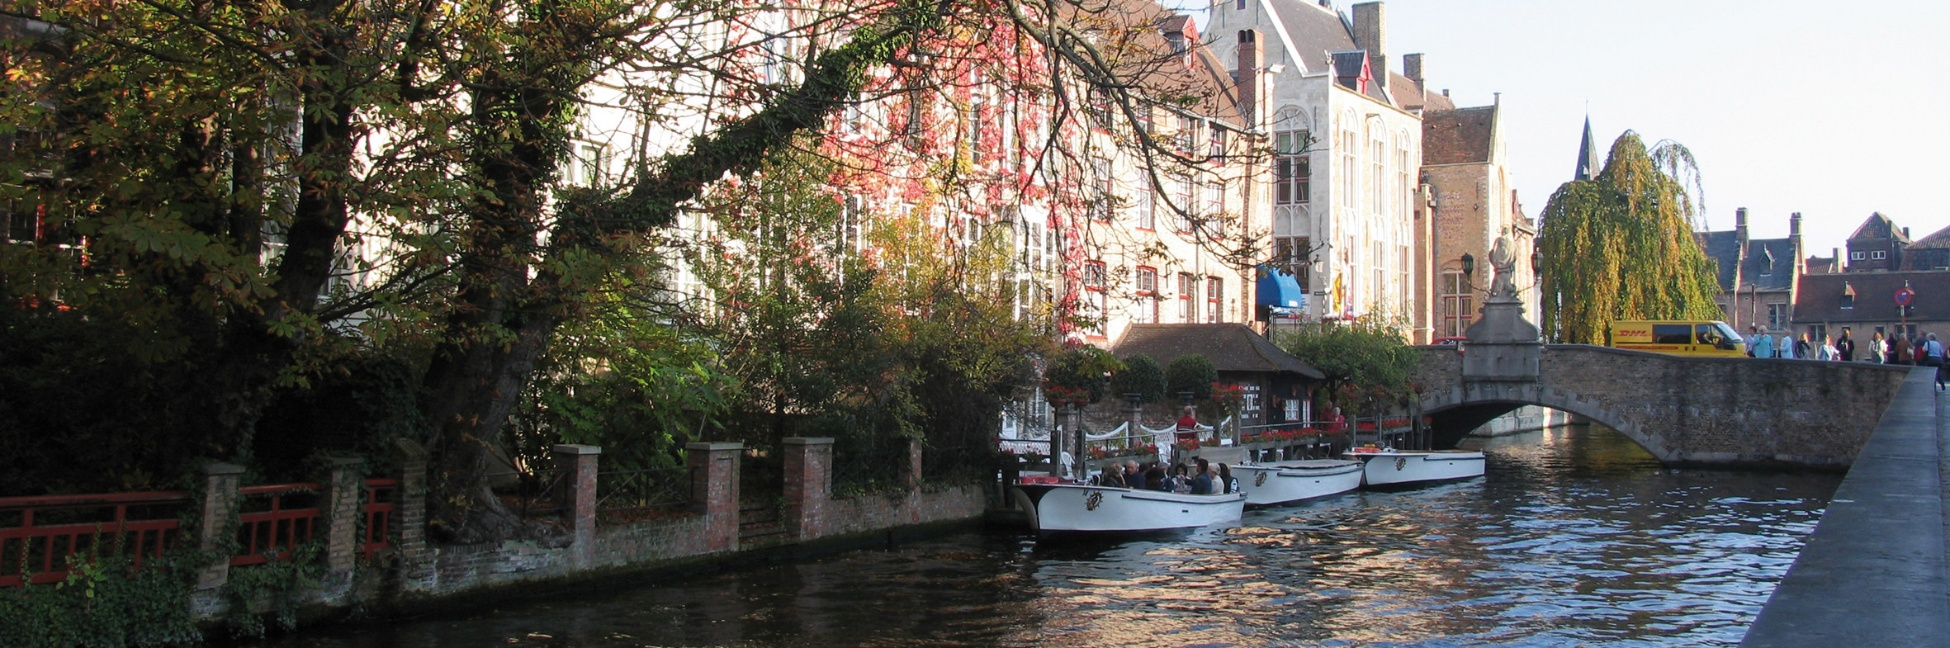 Canal à Bruges en Belgique